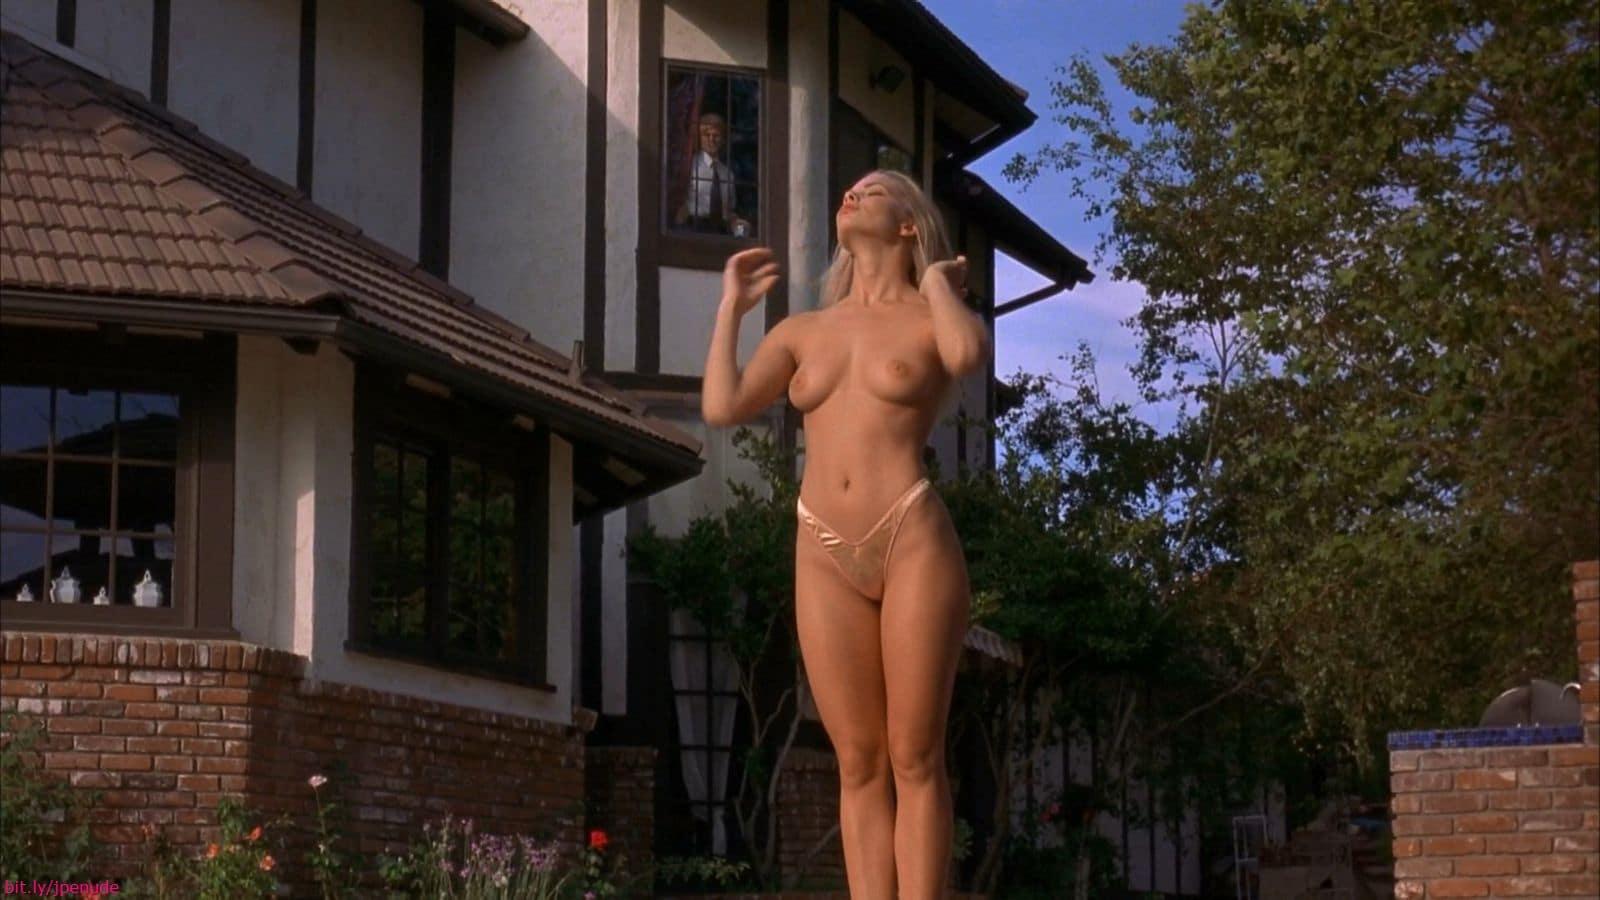 Jaime pressly nude pics